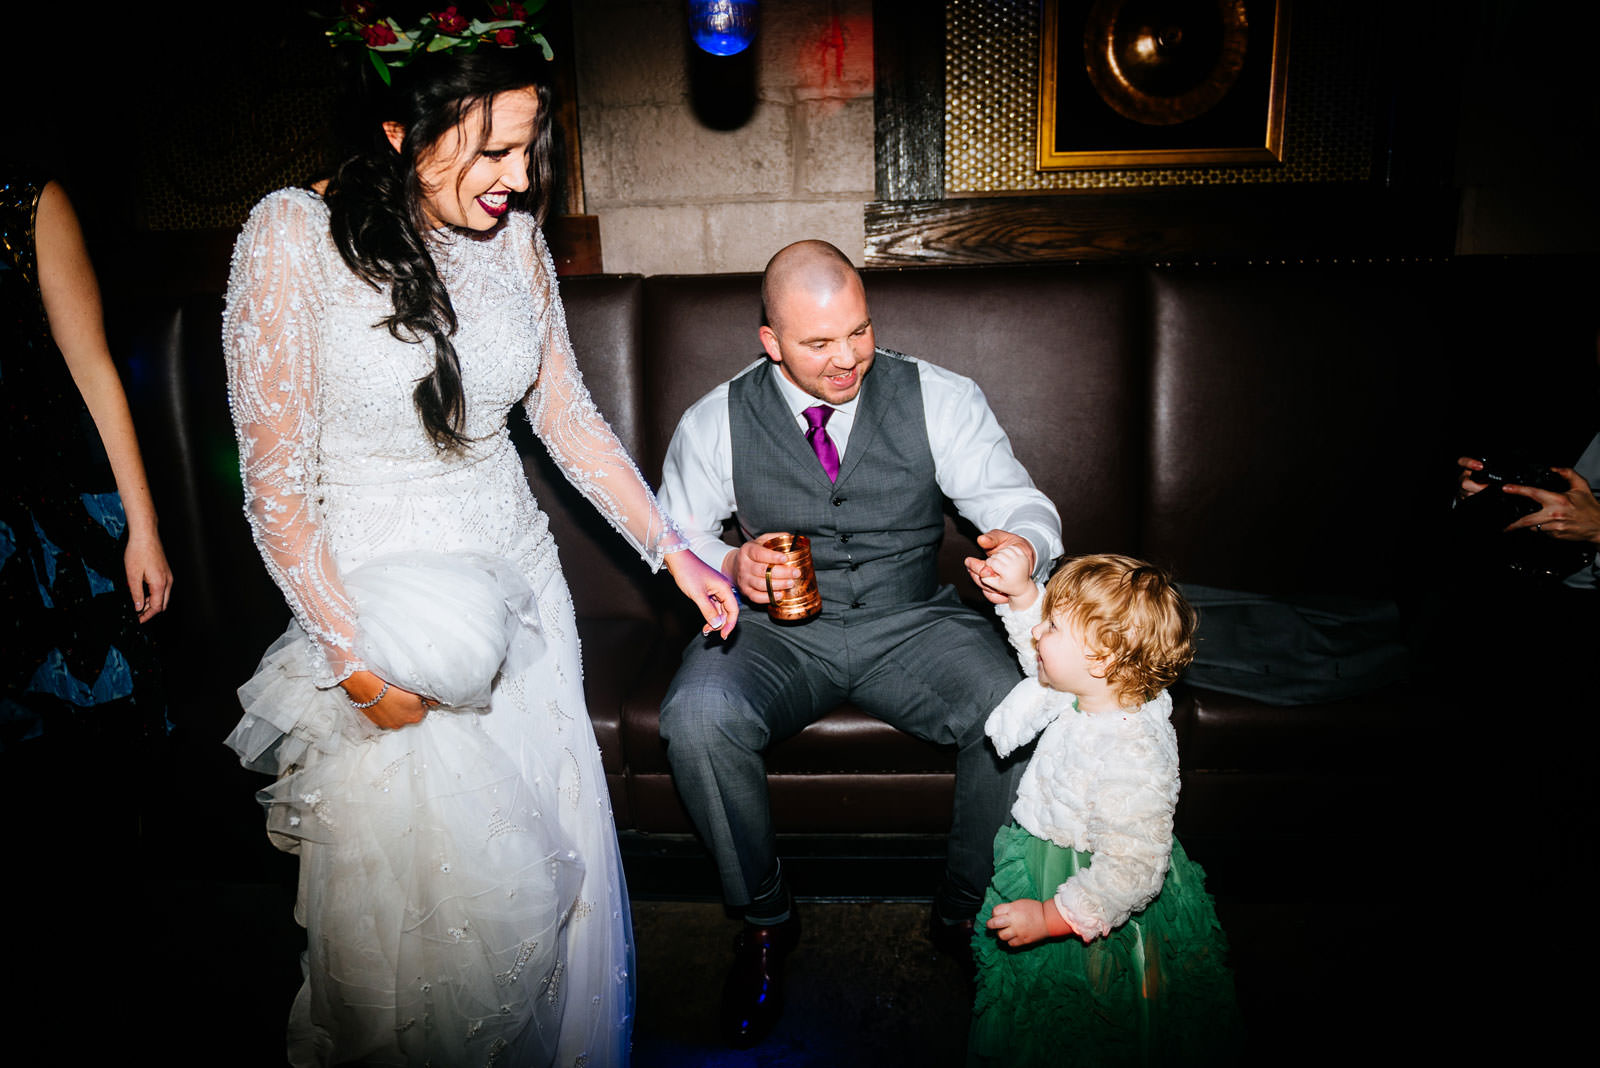 bride groomwith daughter during wedding reception rocktop bar morgantown wv